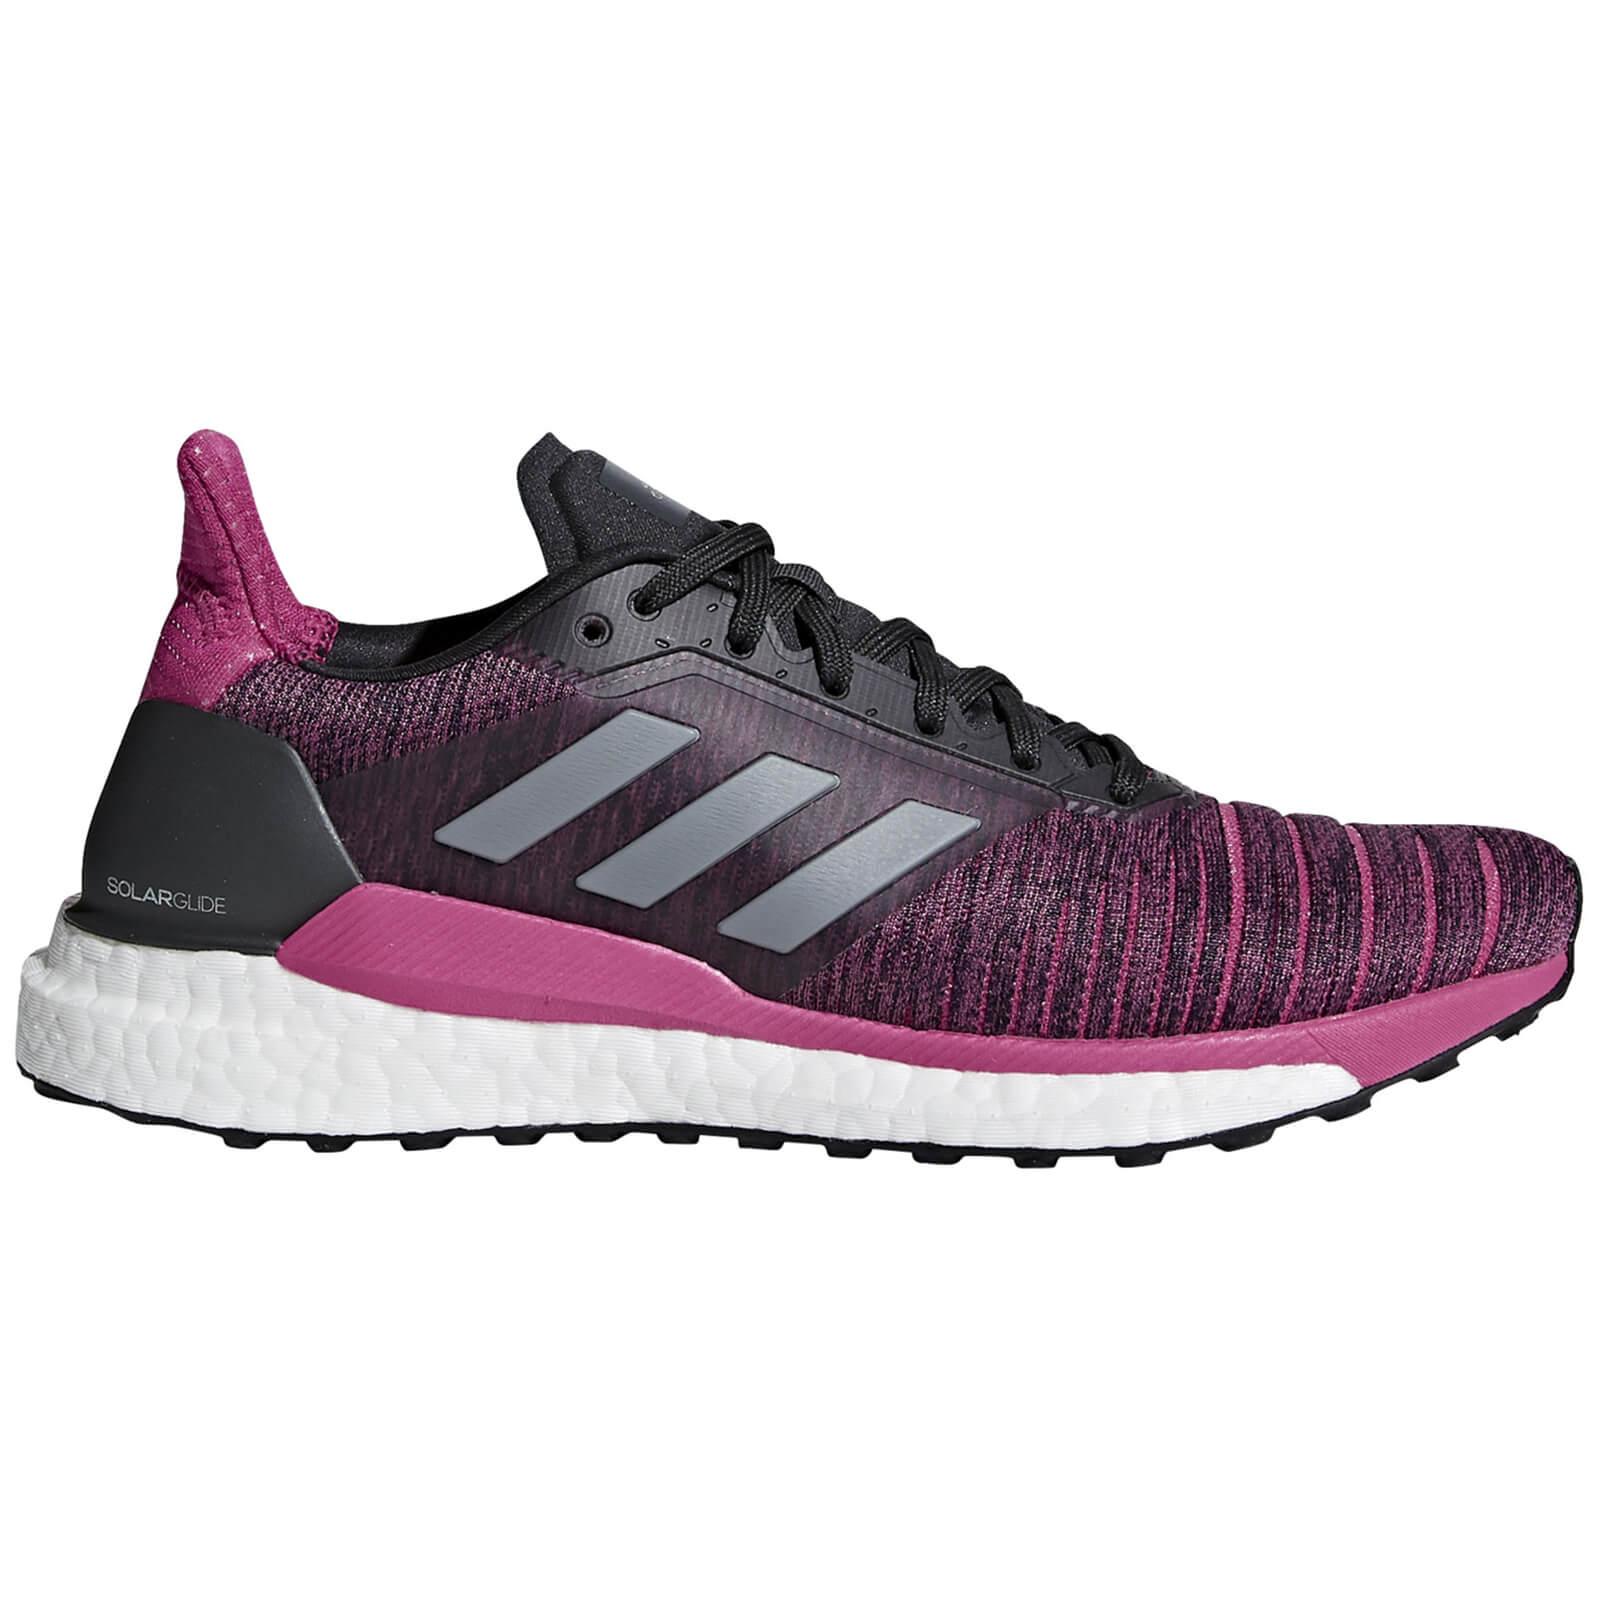 adidas Women's Solar Glide Running Shoes - Grey/Magenta - US 5.5/UK 4 - Grey/Pink